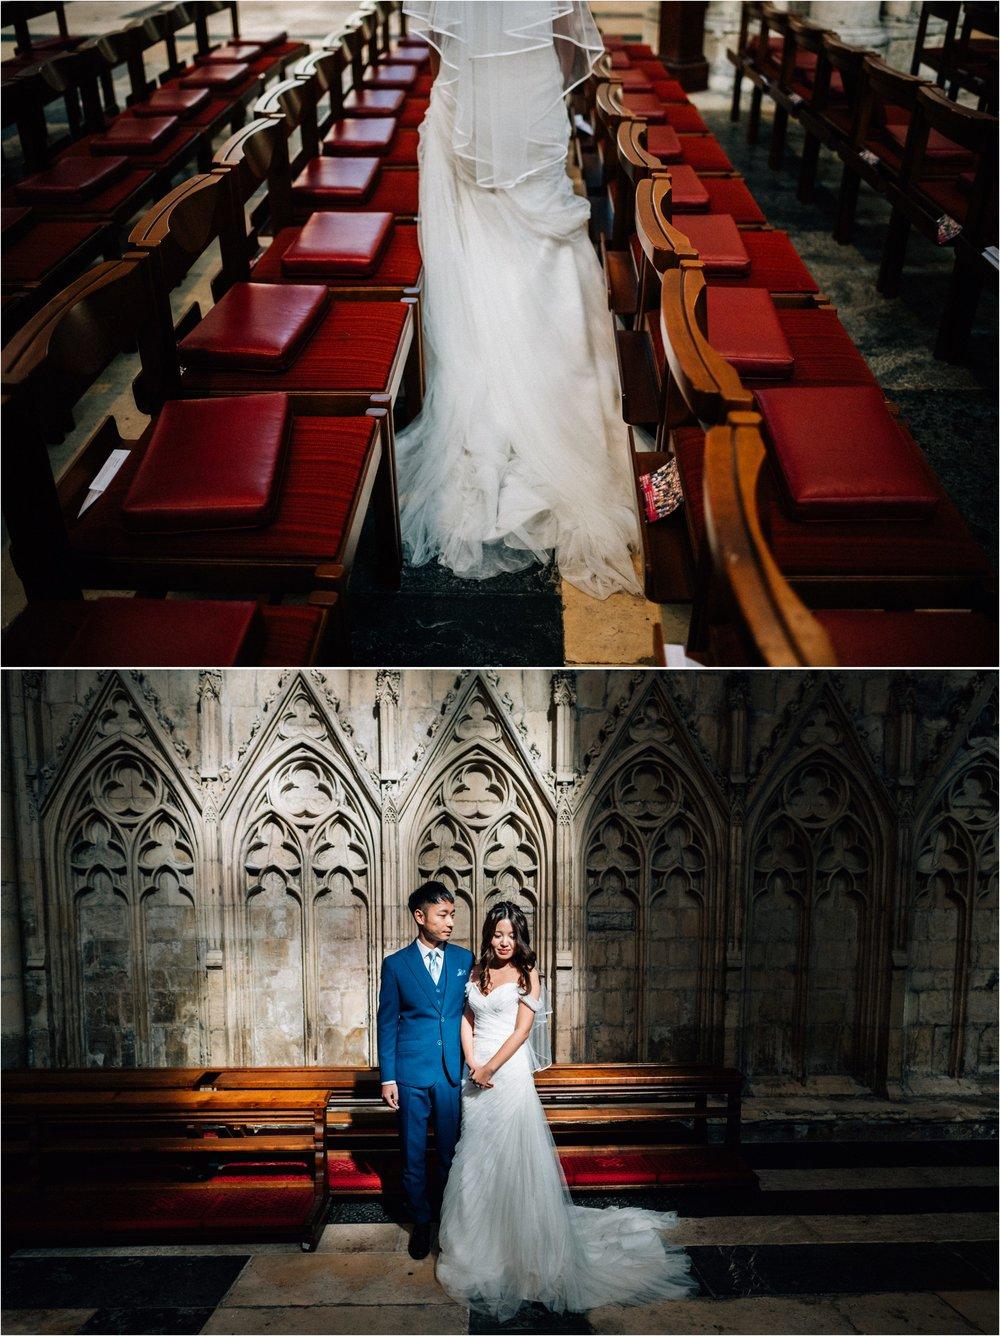 York city elopement wedding photographer_0143.jpg